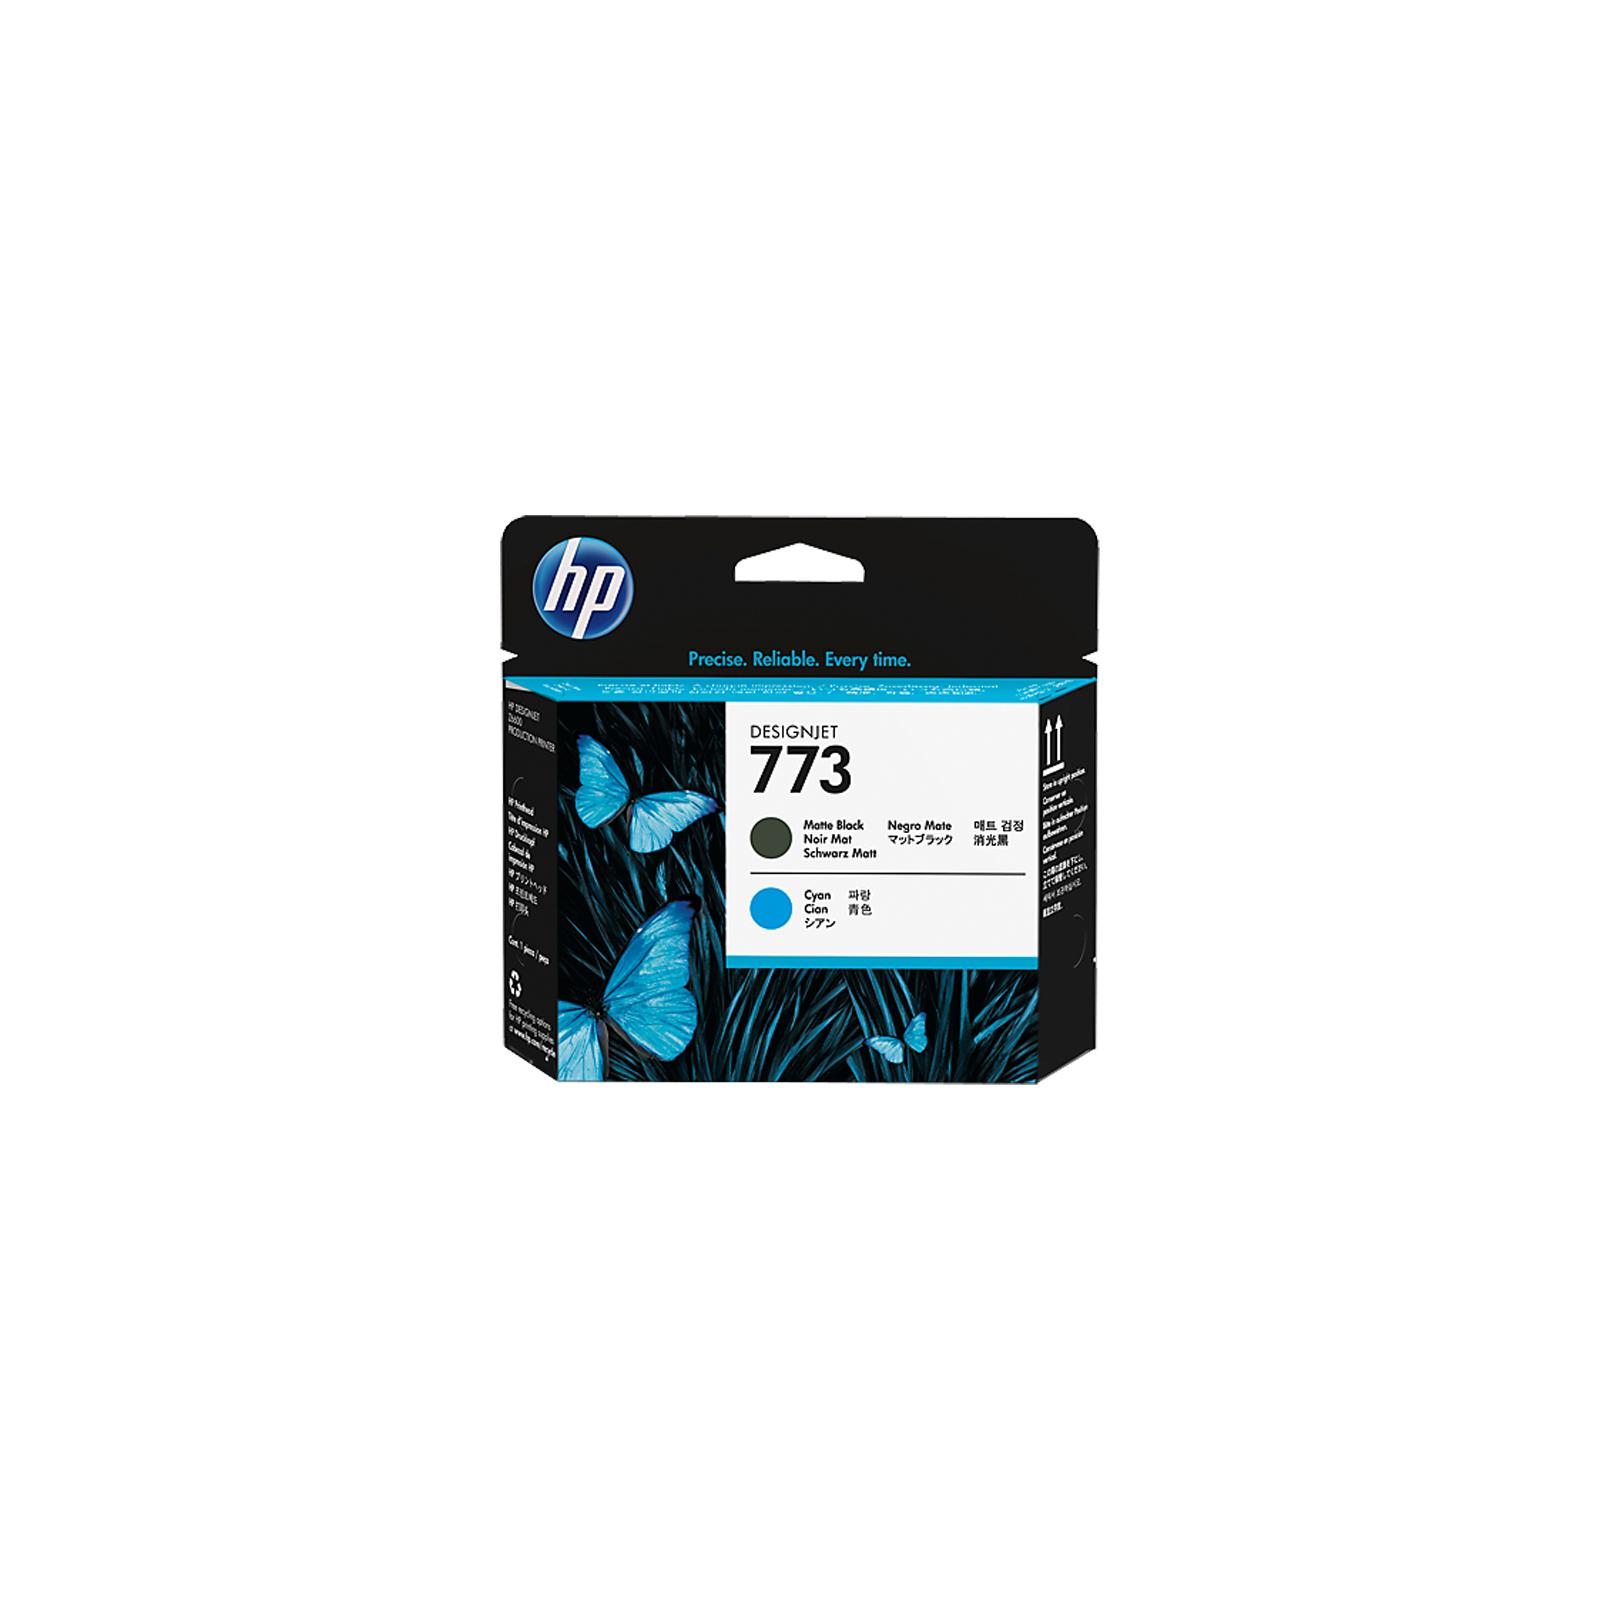 Печатающая головка HP No.773 Matte Black/Cyan Designjet Printhead (C1Q20A)